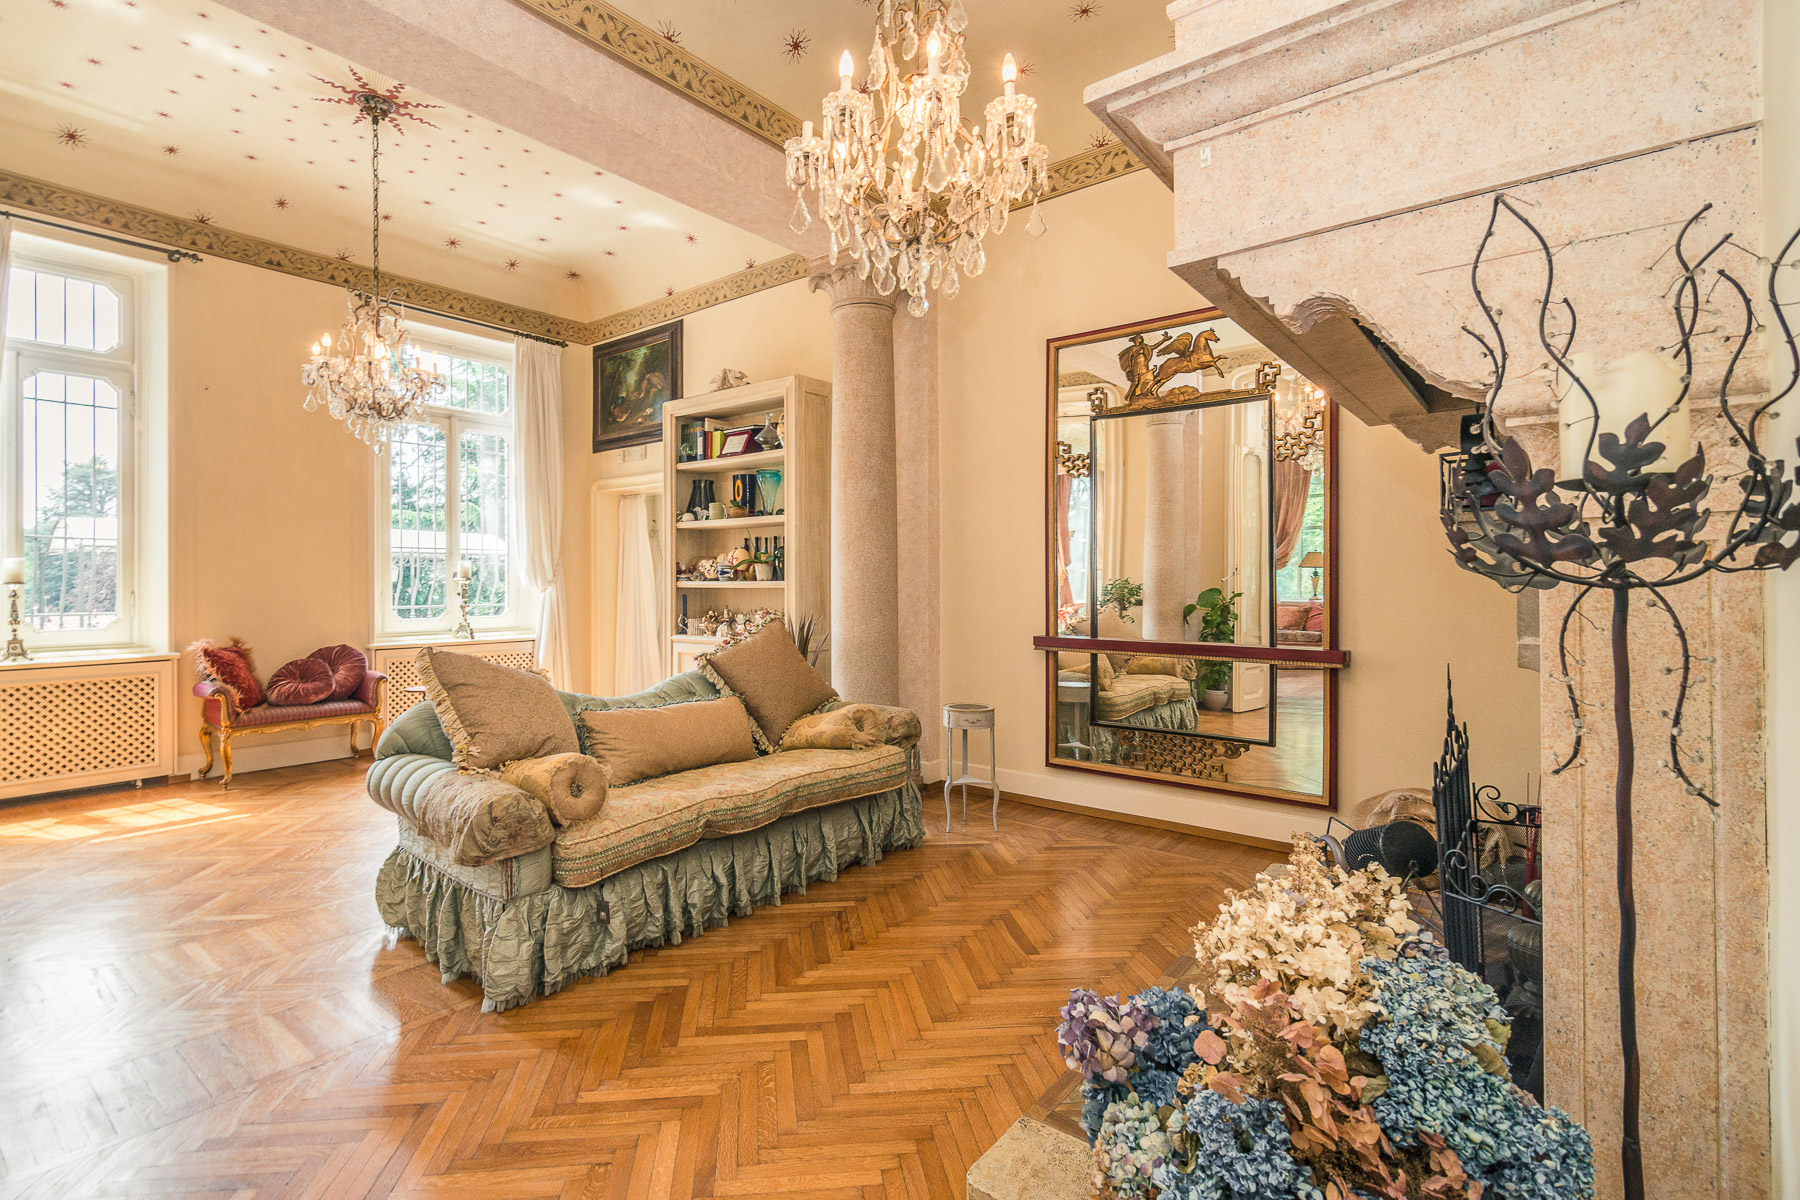 Villa in Vendita a Varese: 5 locali, 1150 mq - Foto 11